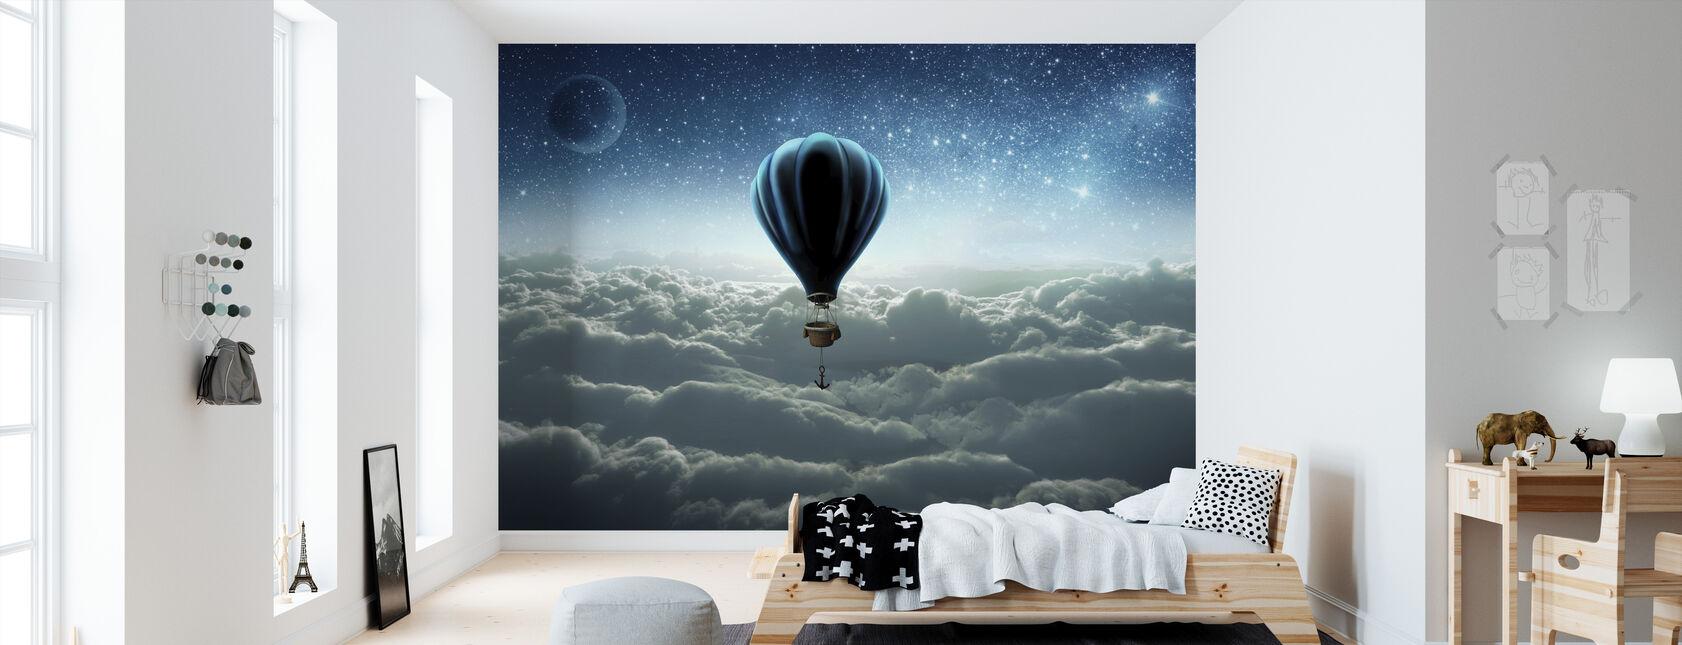 Varmluftsballong - Tapet - Barnerom